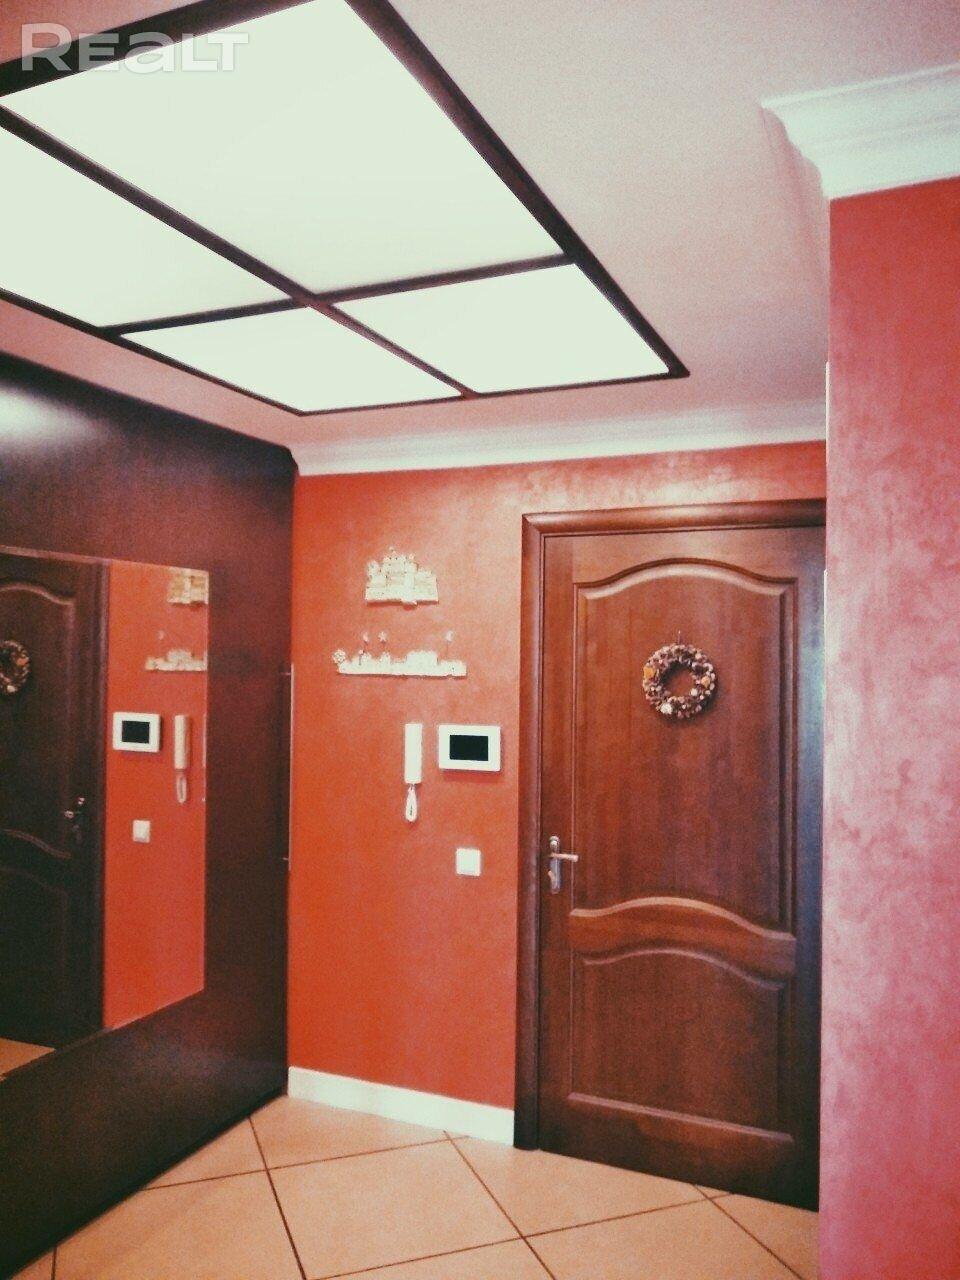 Продается 3-х комнатная квартира, Витебск - фото №4